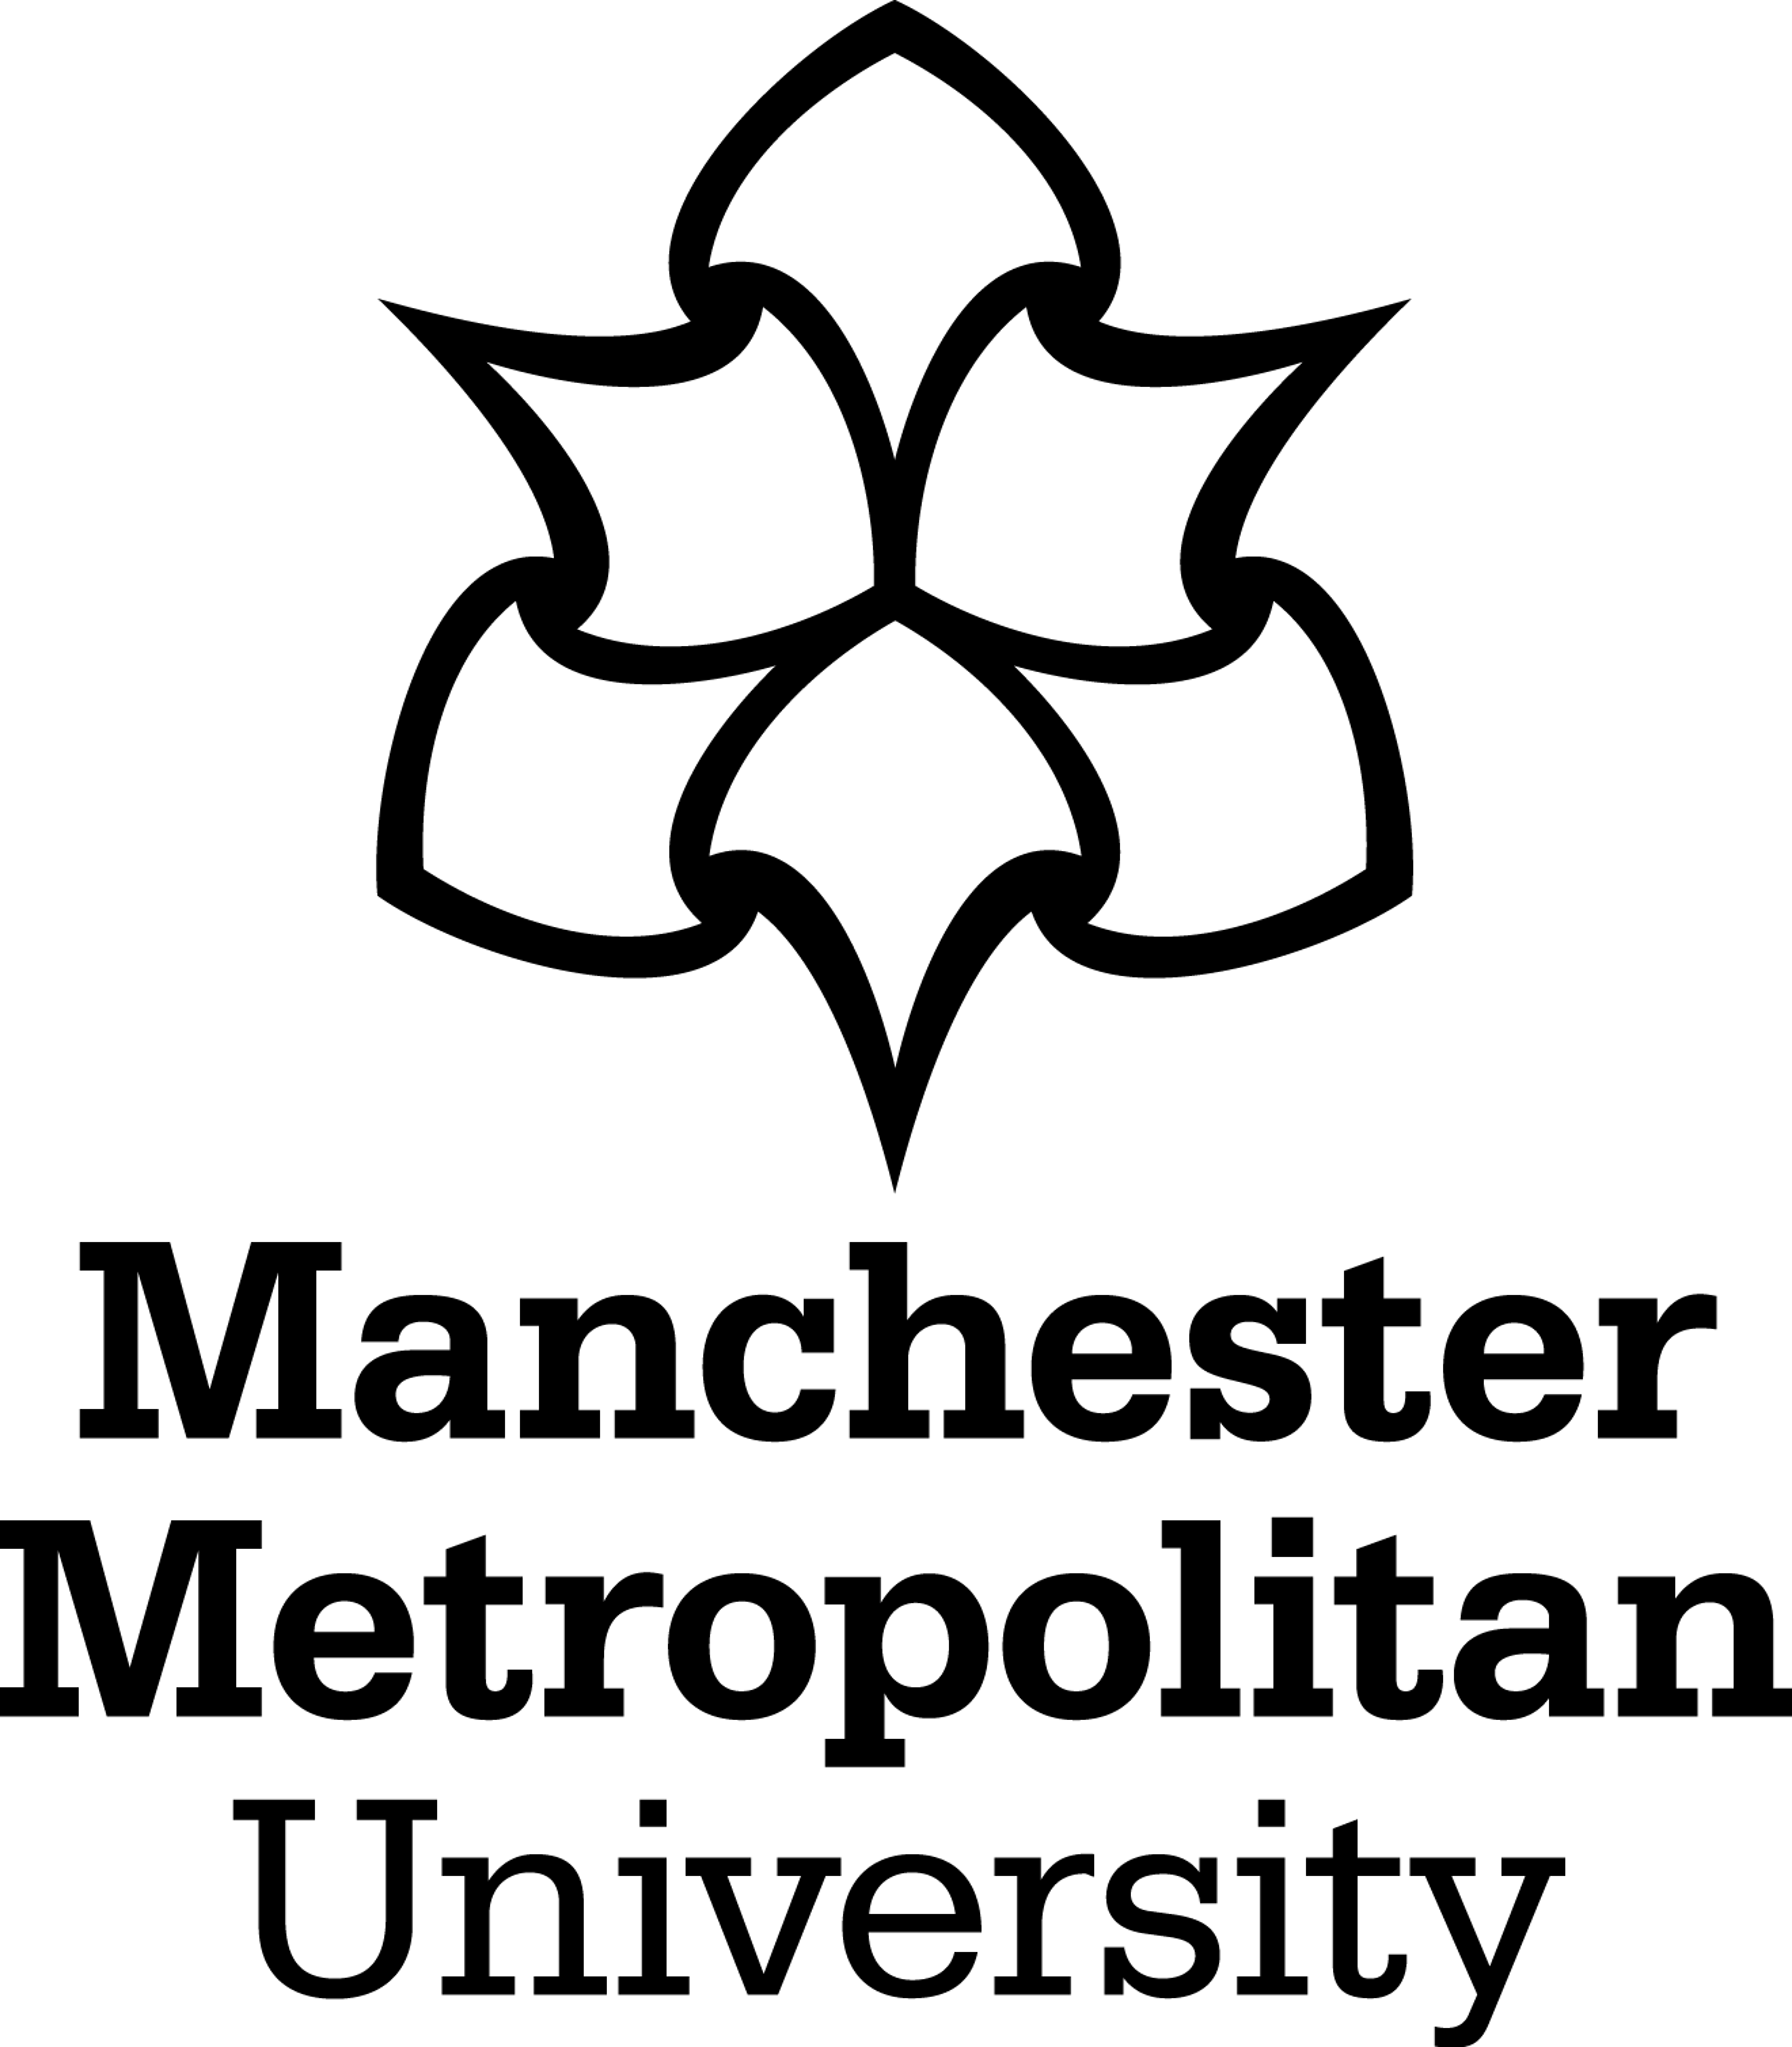 Logo 1479728927.png?ixlib=rb 1.1